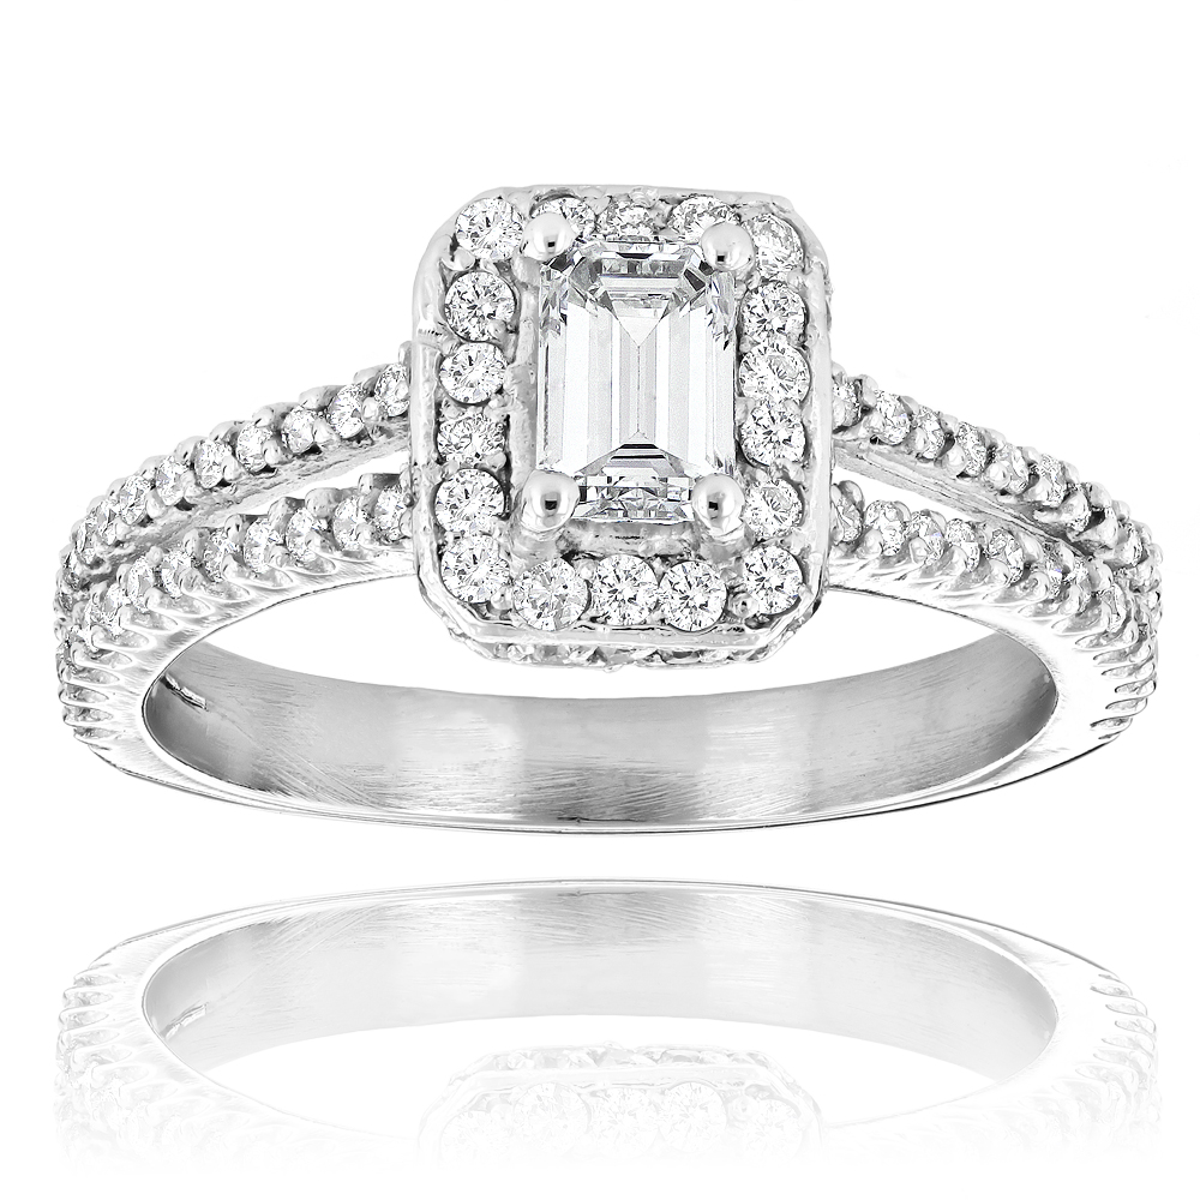 Halo Emerald Cut Diamond Engagement Ring 1.21ct 14K Gold